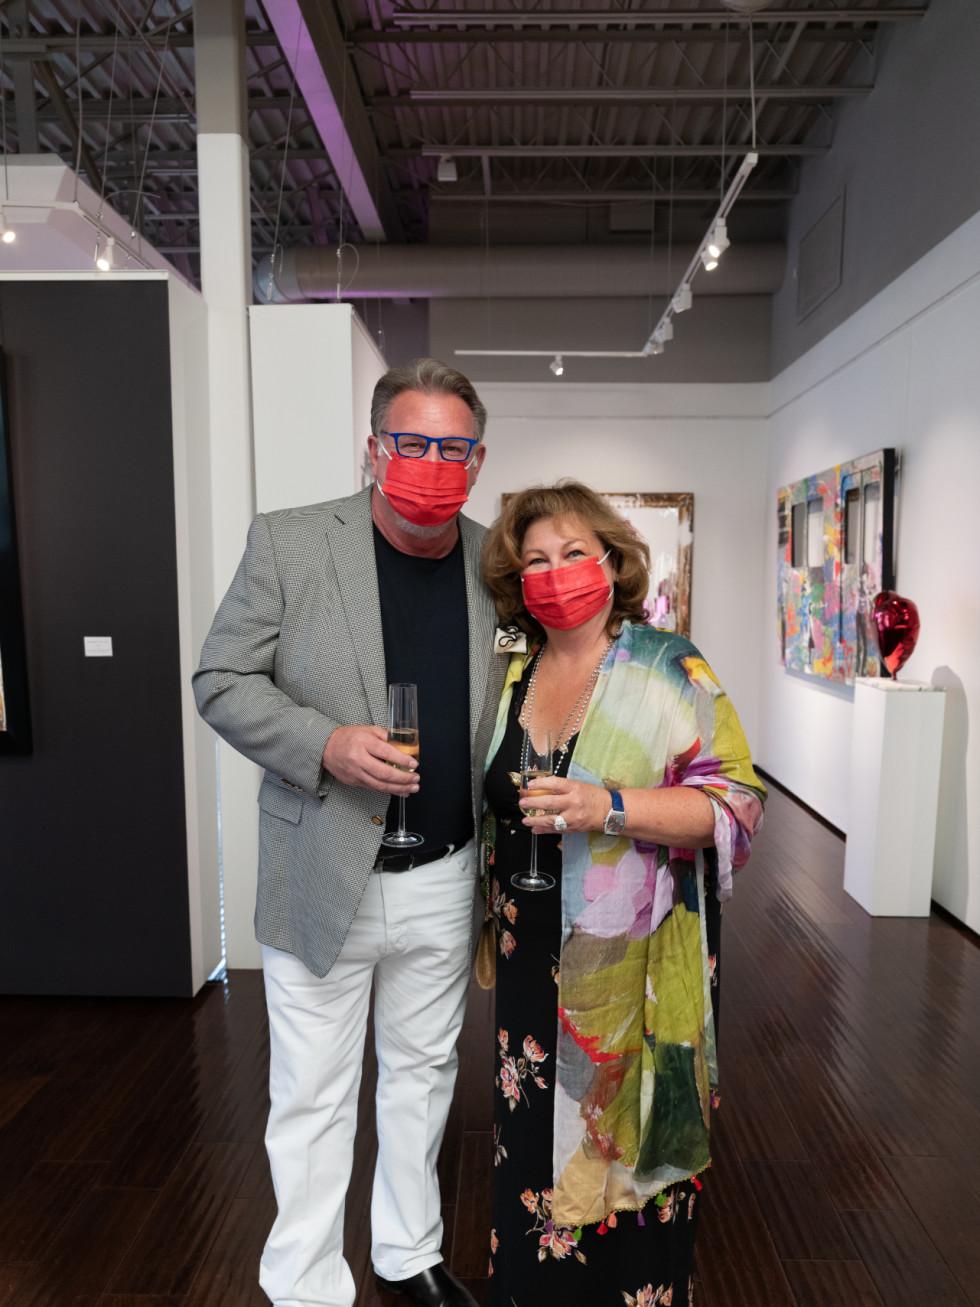 Arts, Hearts, Cars Art of the World Gallery Mr Brainwash RobinDanny Klaes